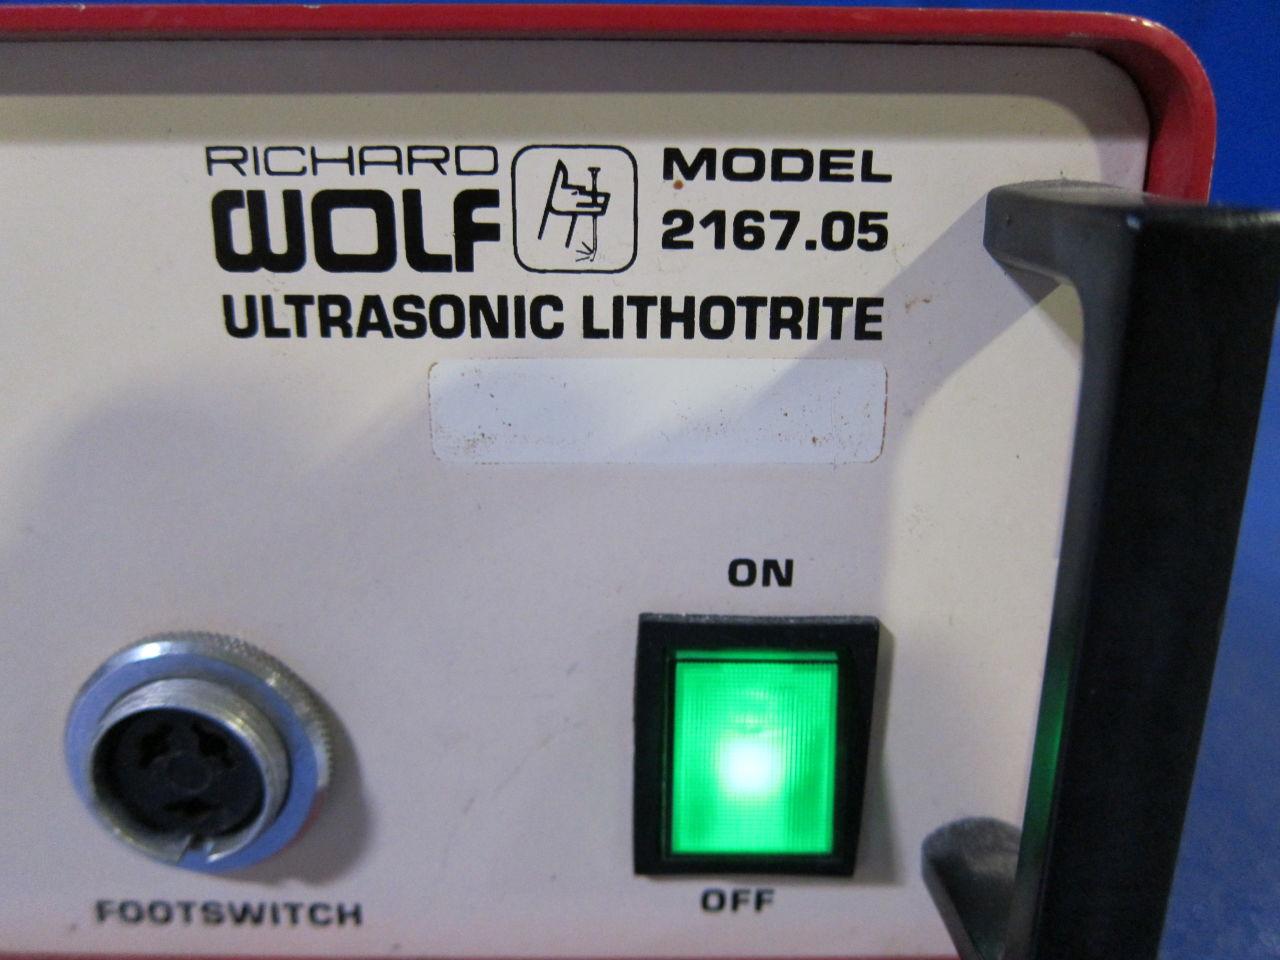 RICHARD WOLF 2167.05 Lithotripter